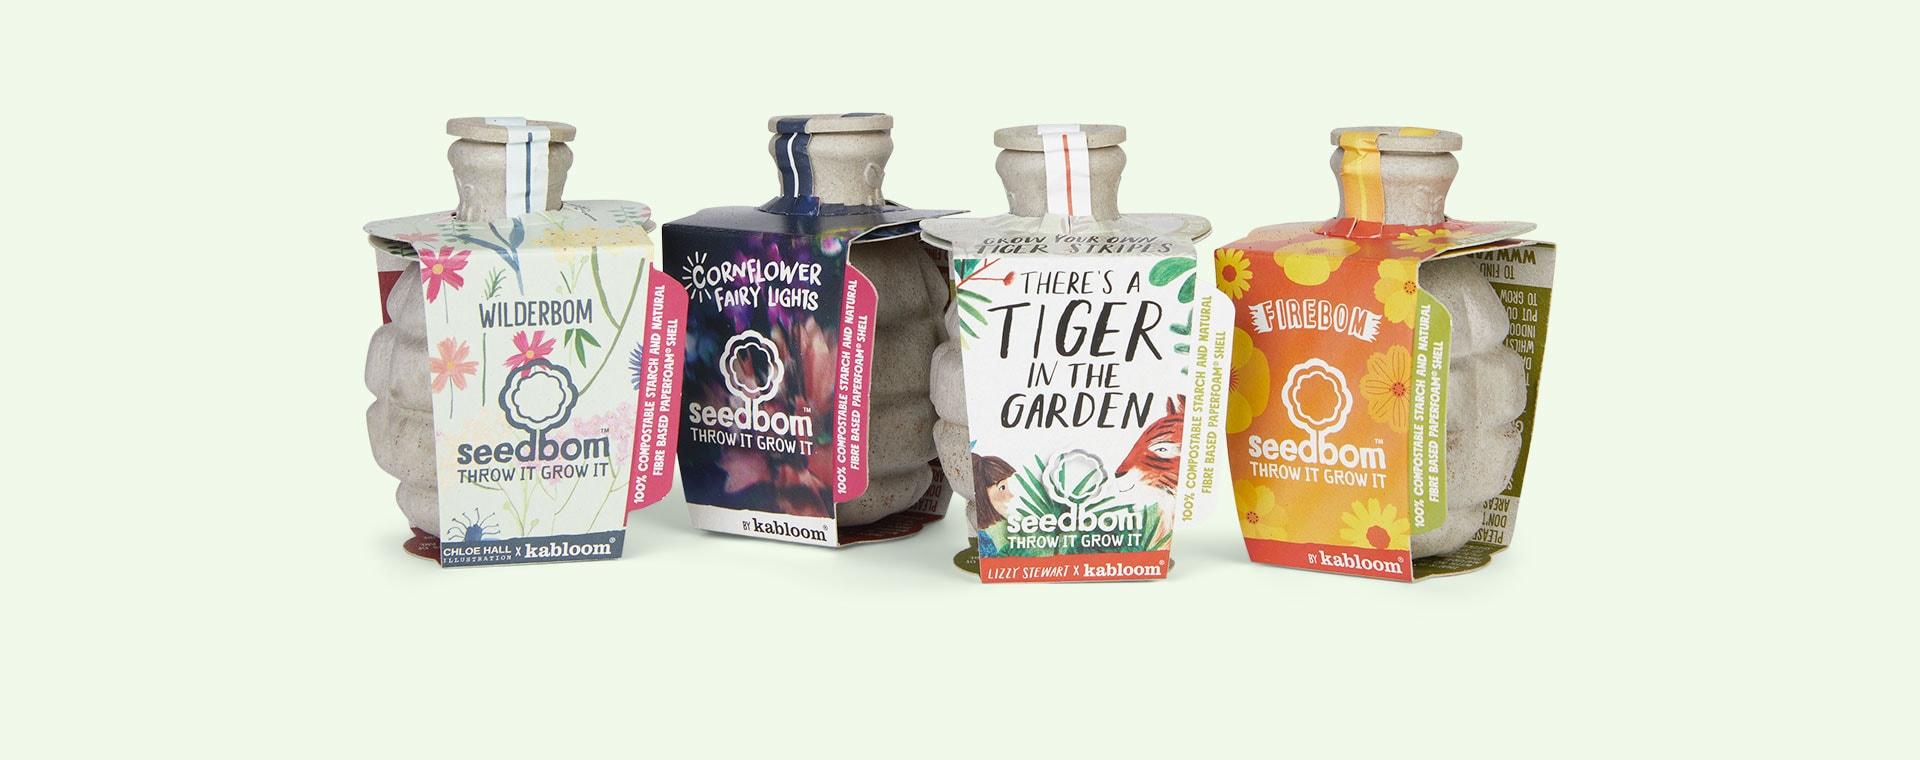 Brilliant Botanics Seedbom Seedbom Gift Box